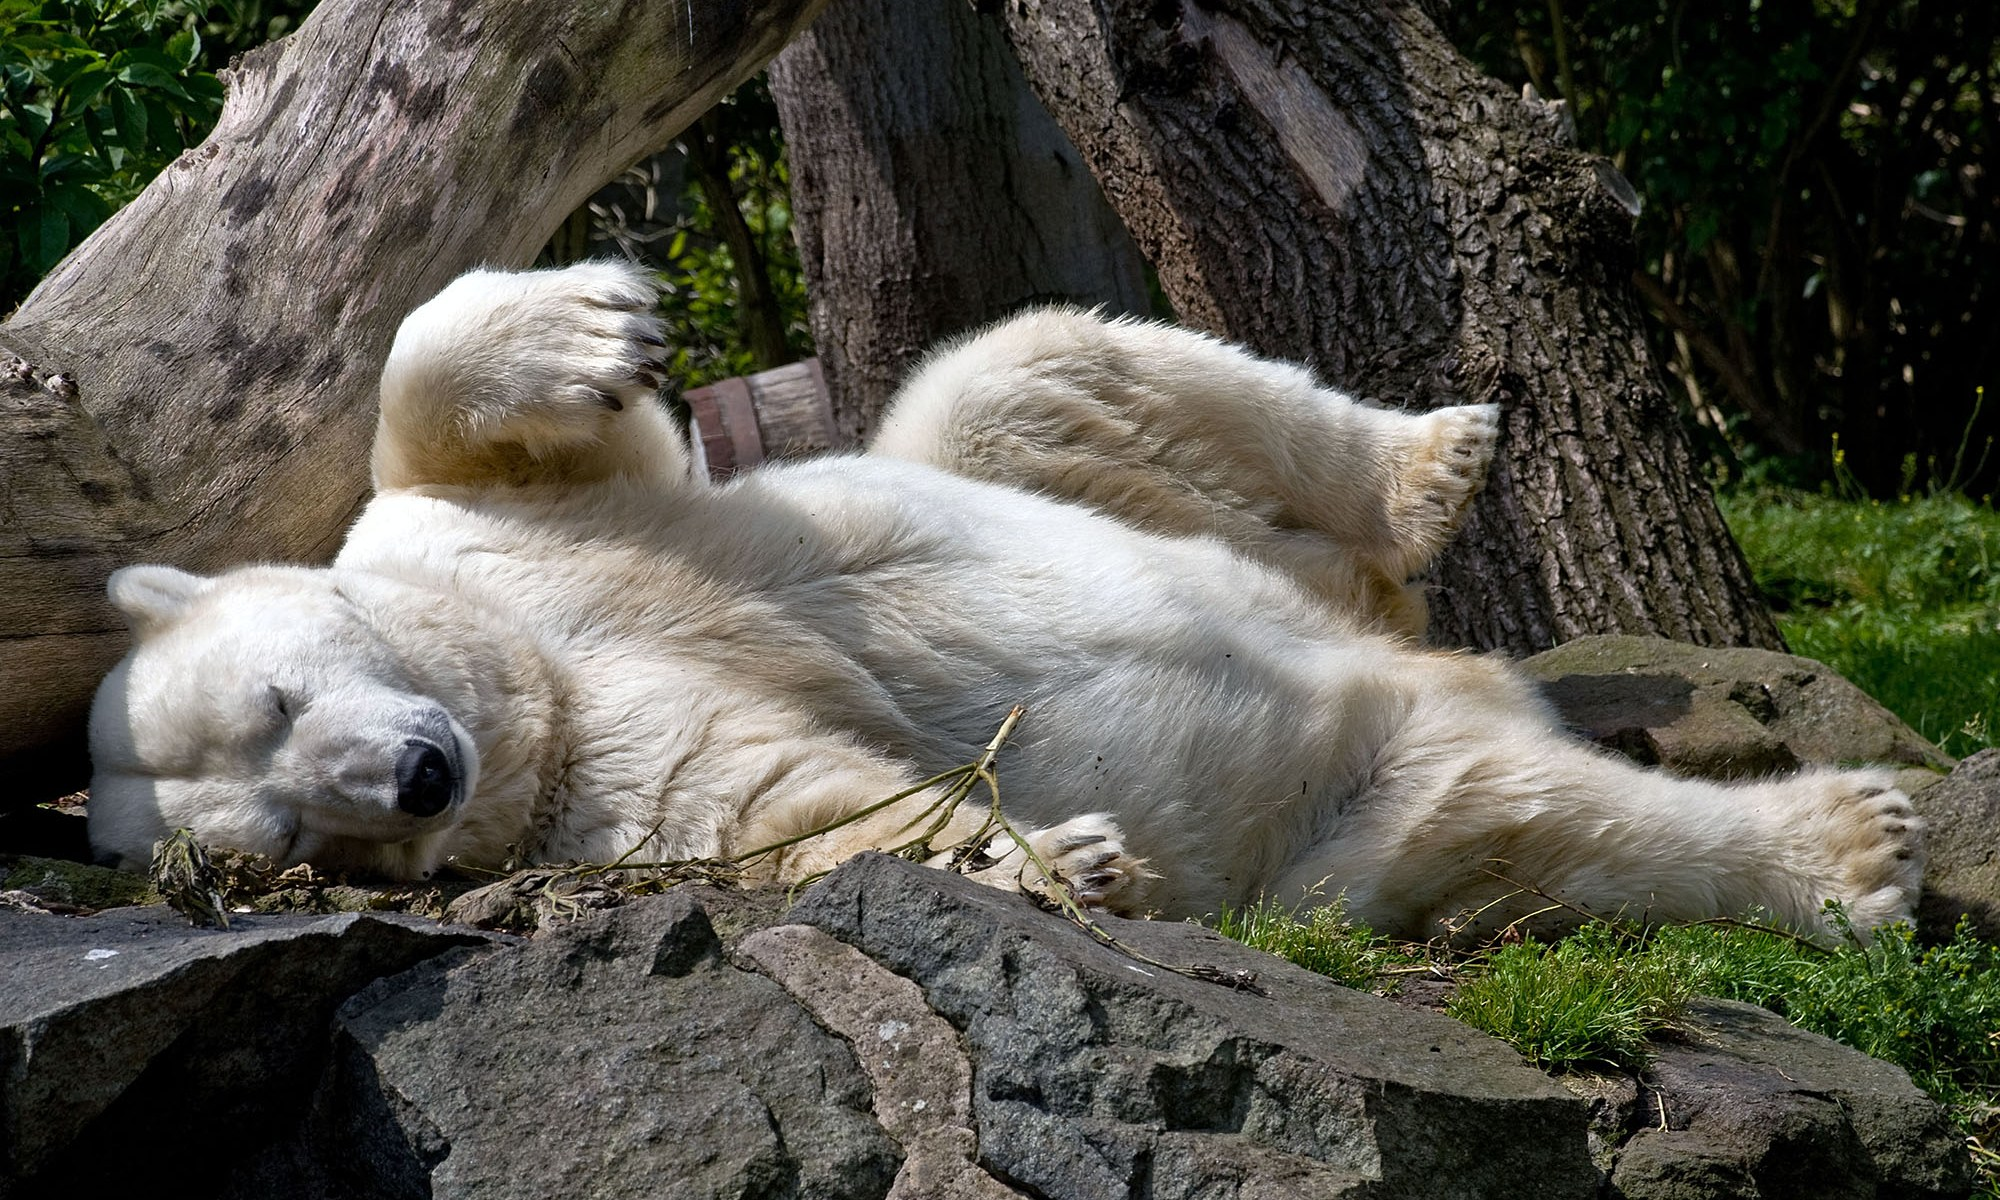 Mercedes the Polar Bear at Edinburgh Zoo